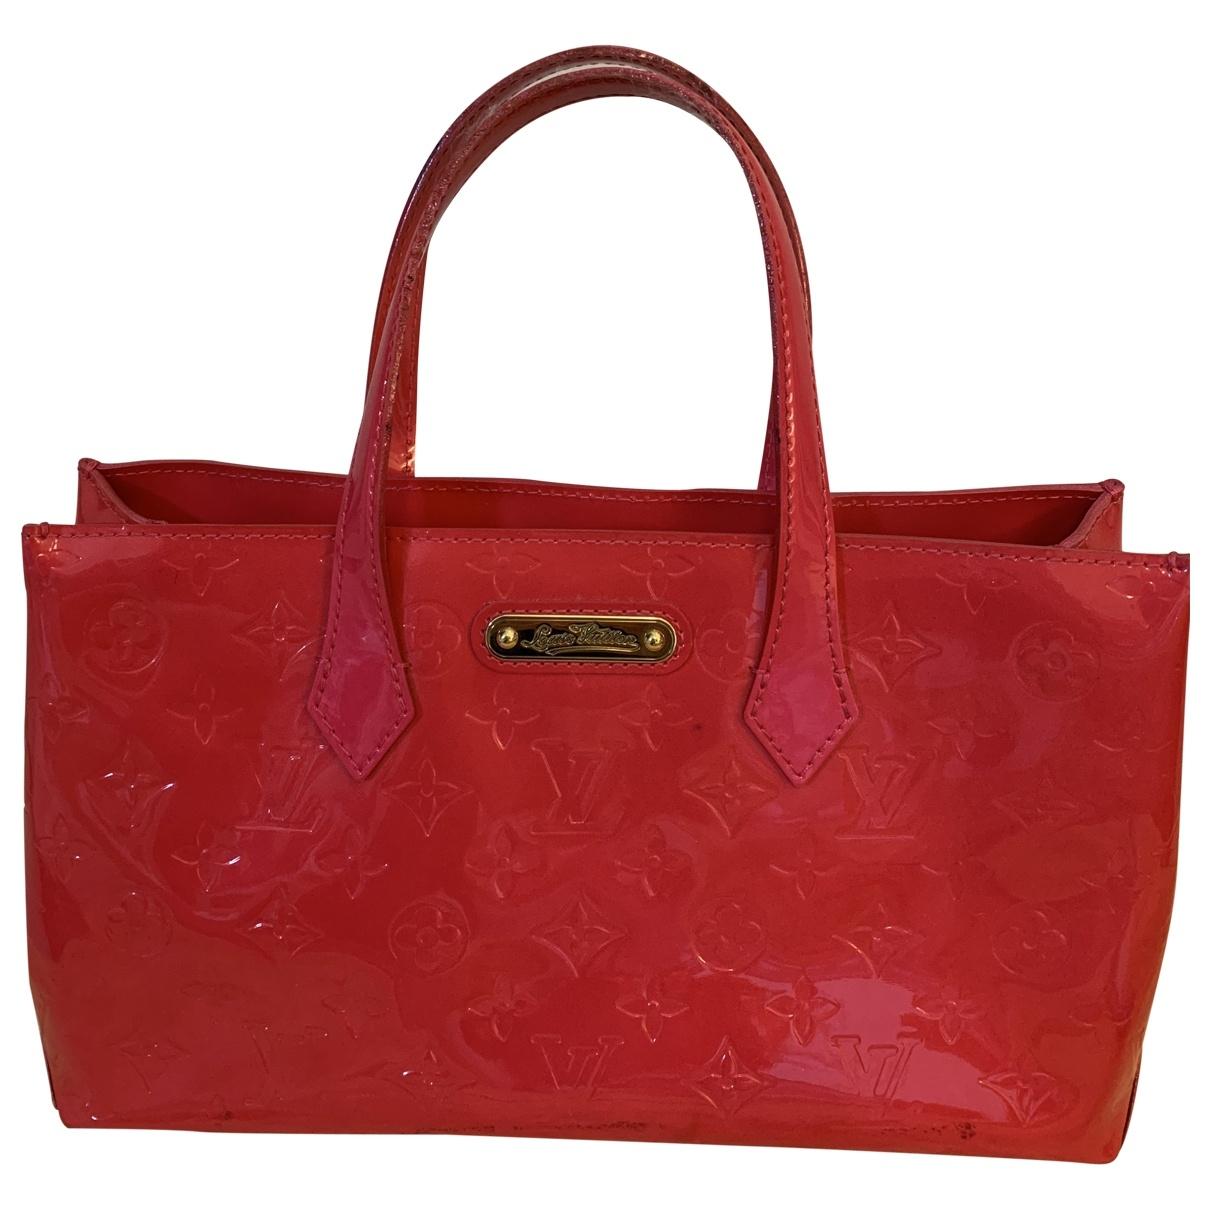 Louis Vuitton Wilshire Pink Patent leather handbag for Women \N